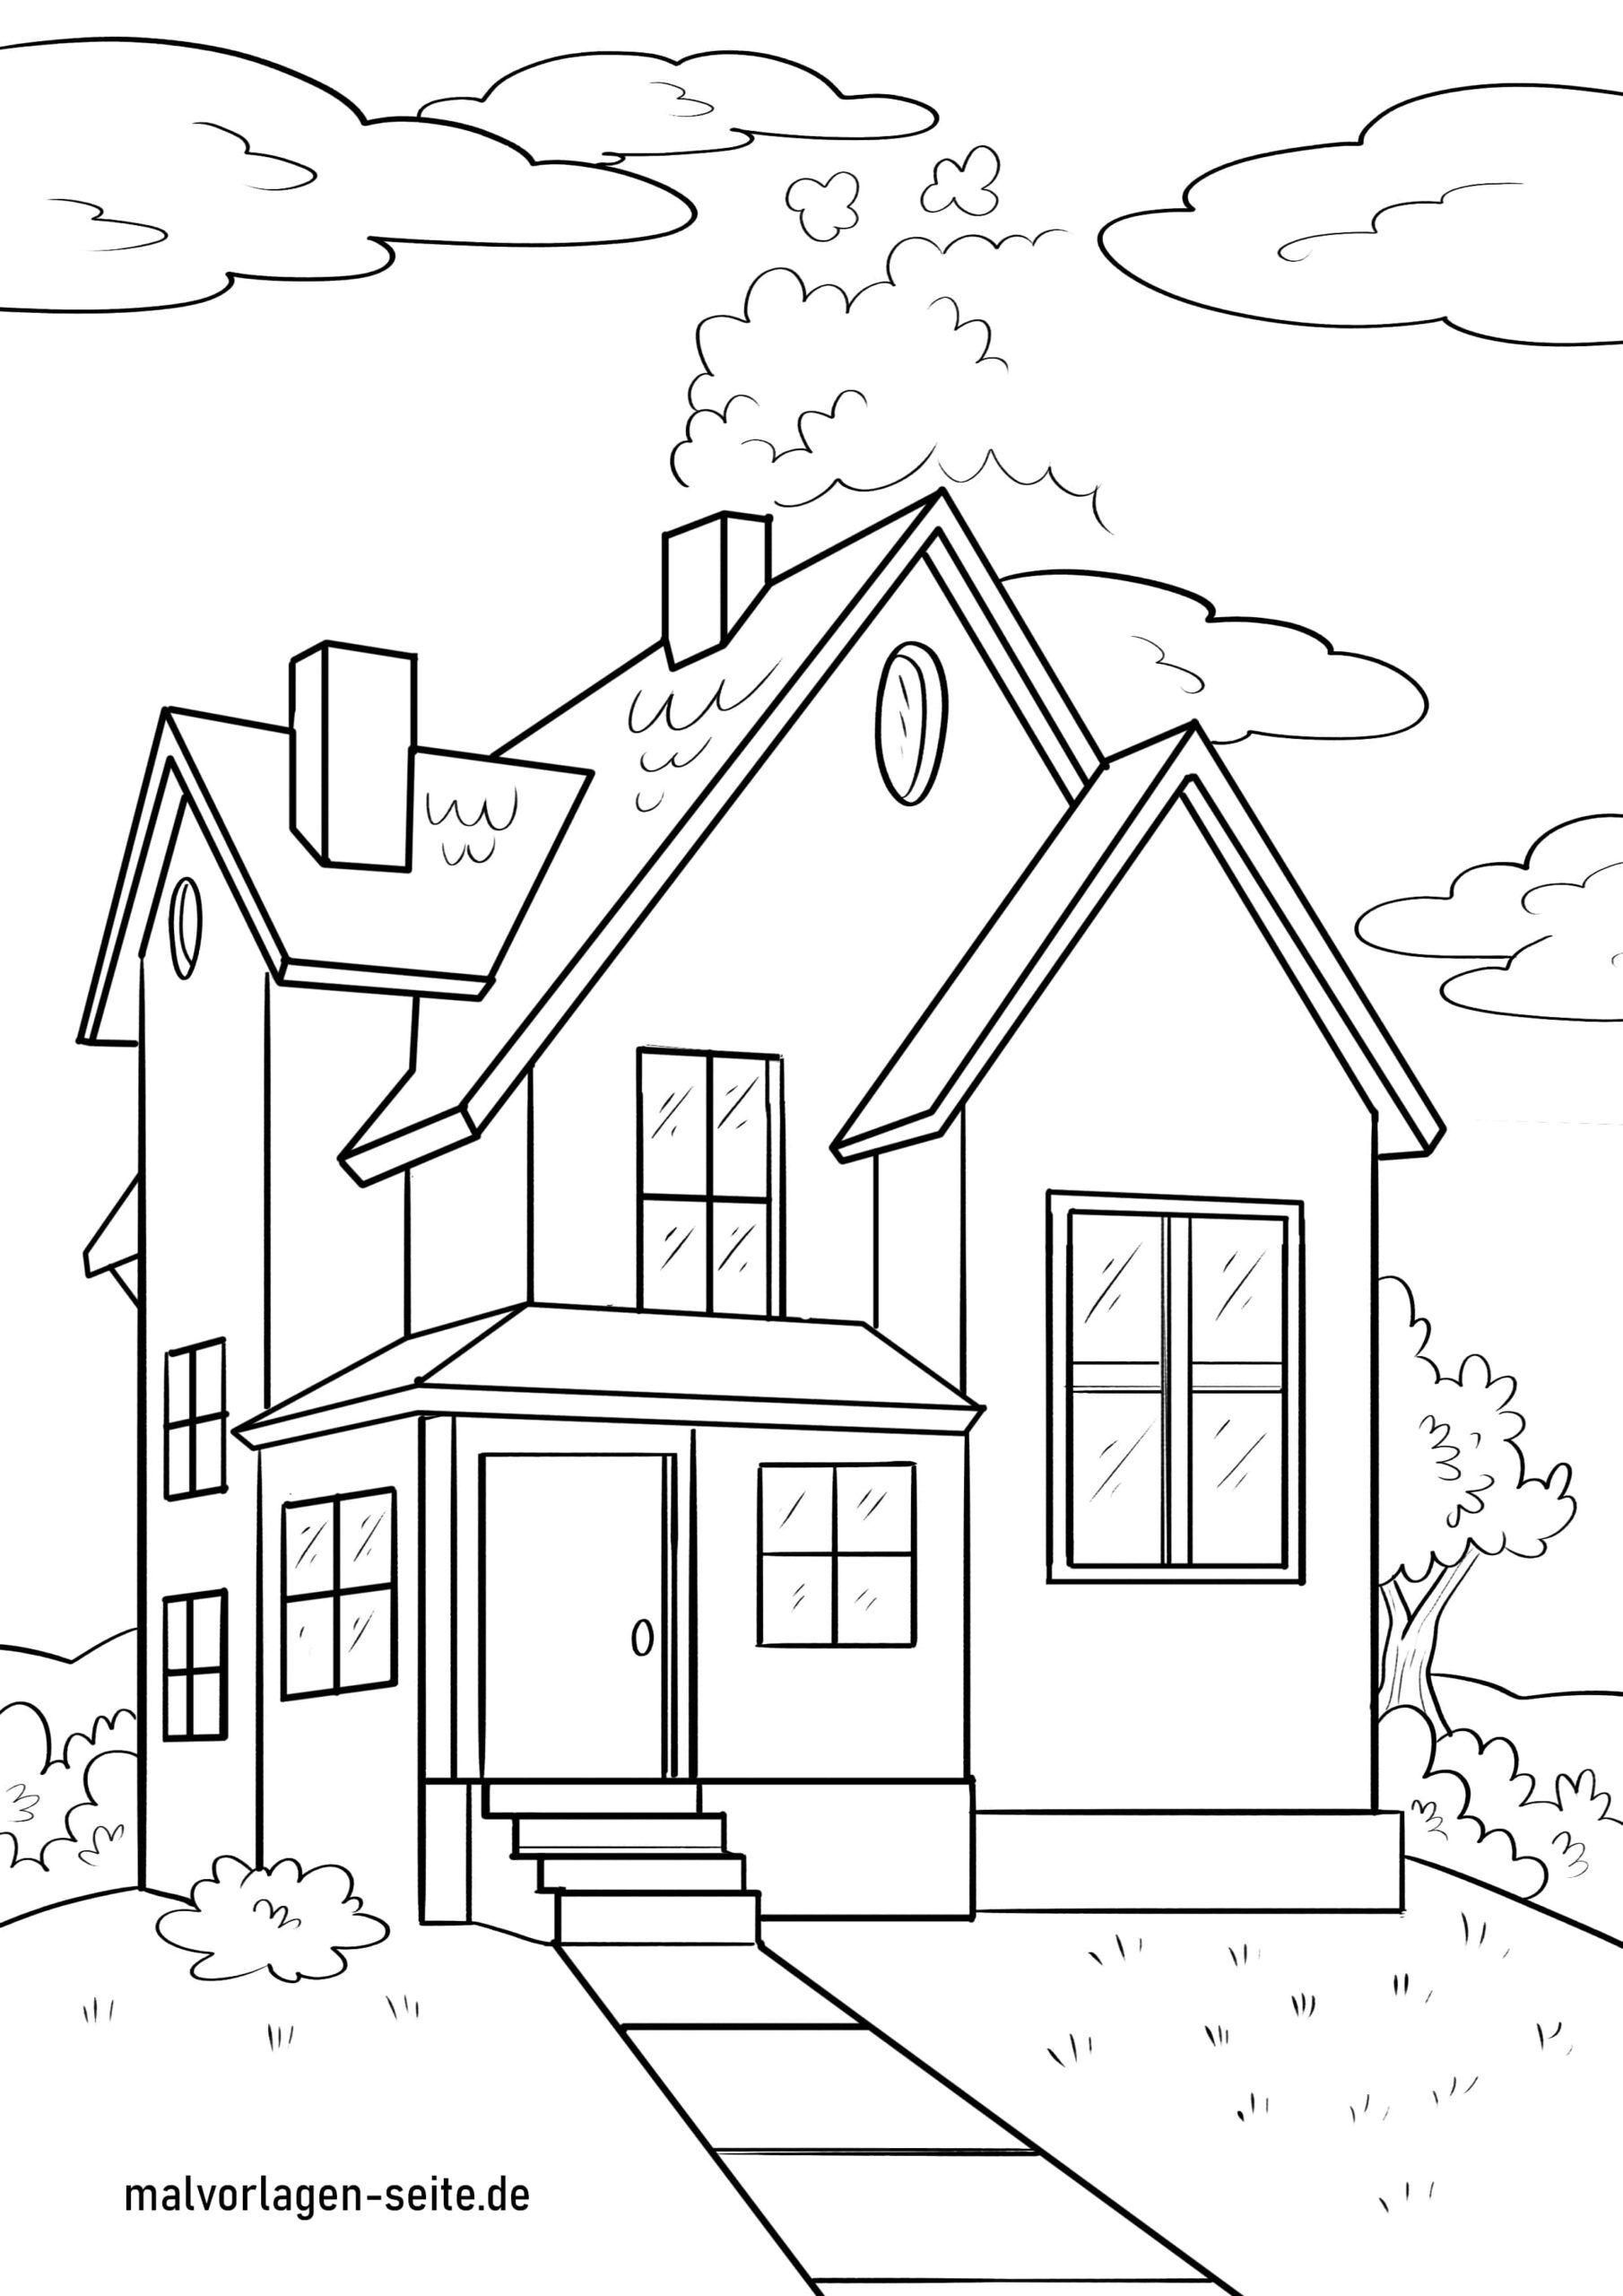 Раскрыць дом